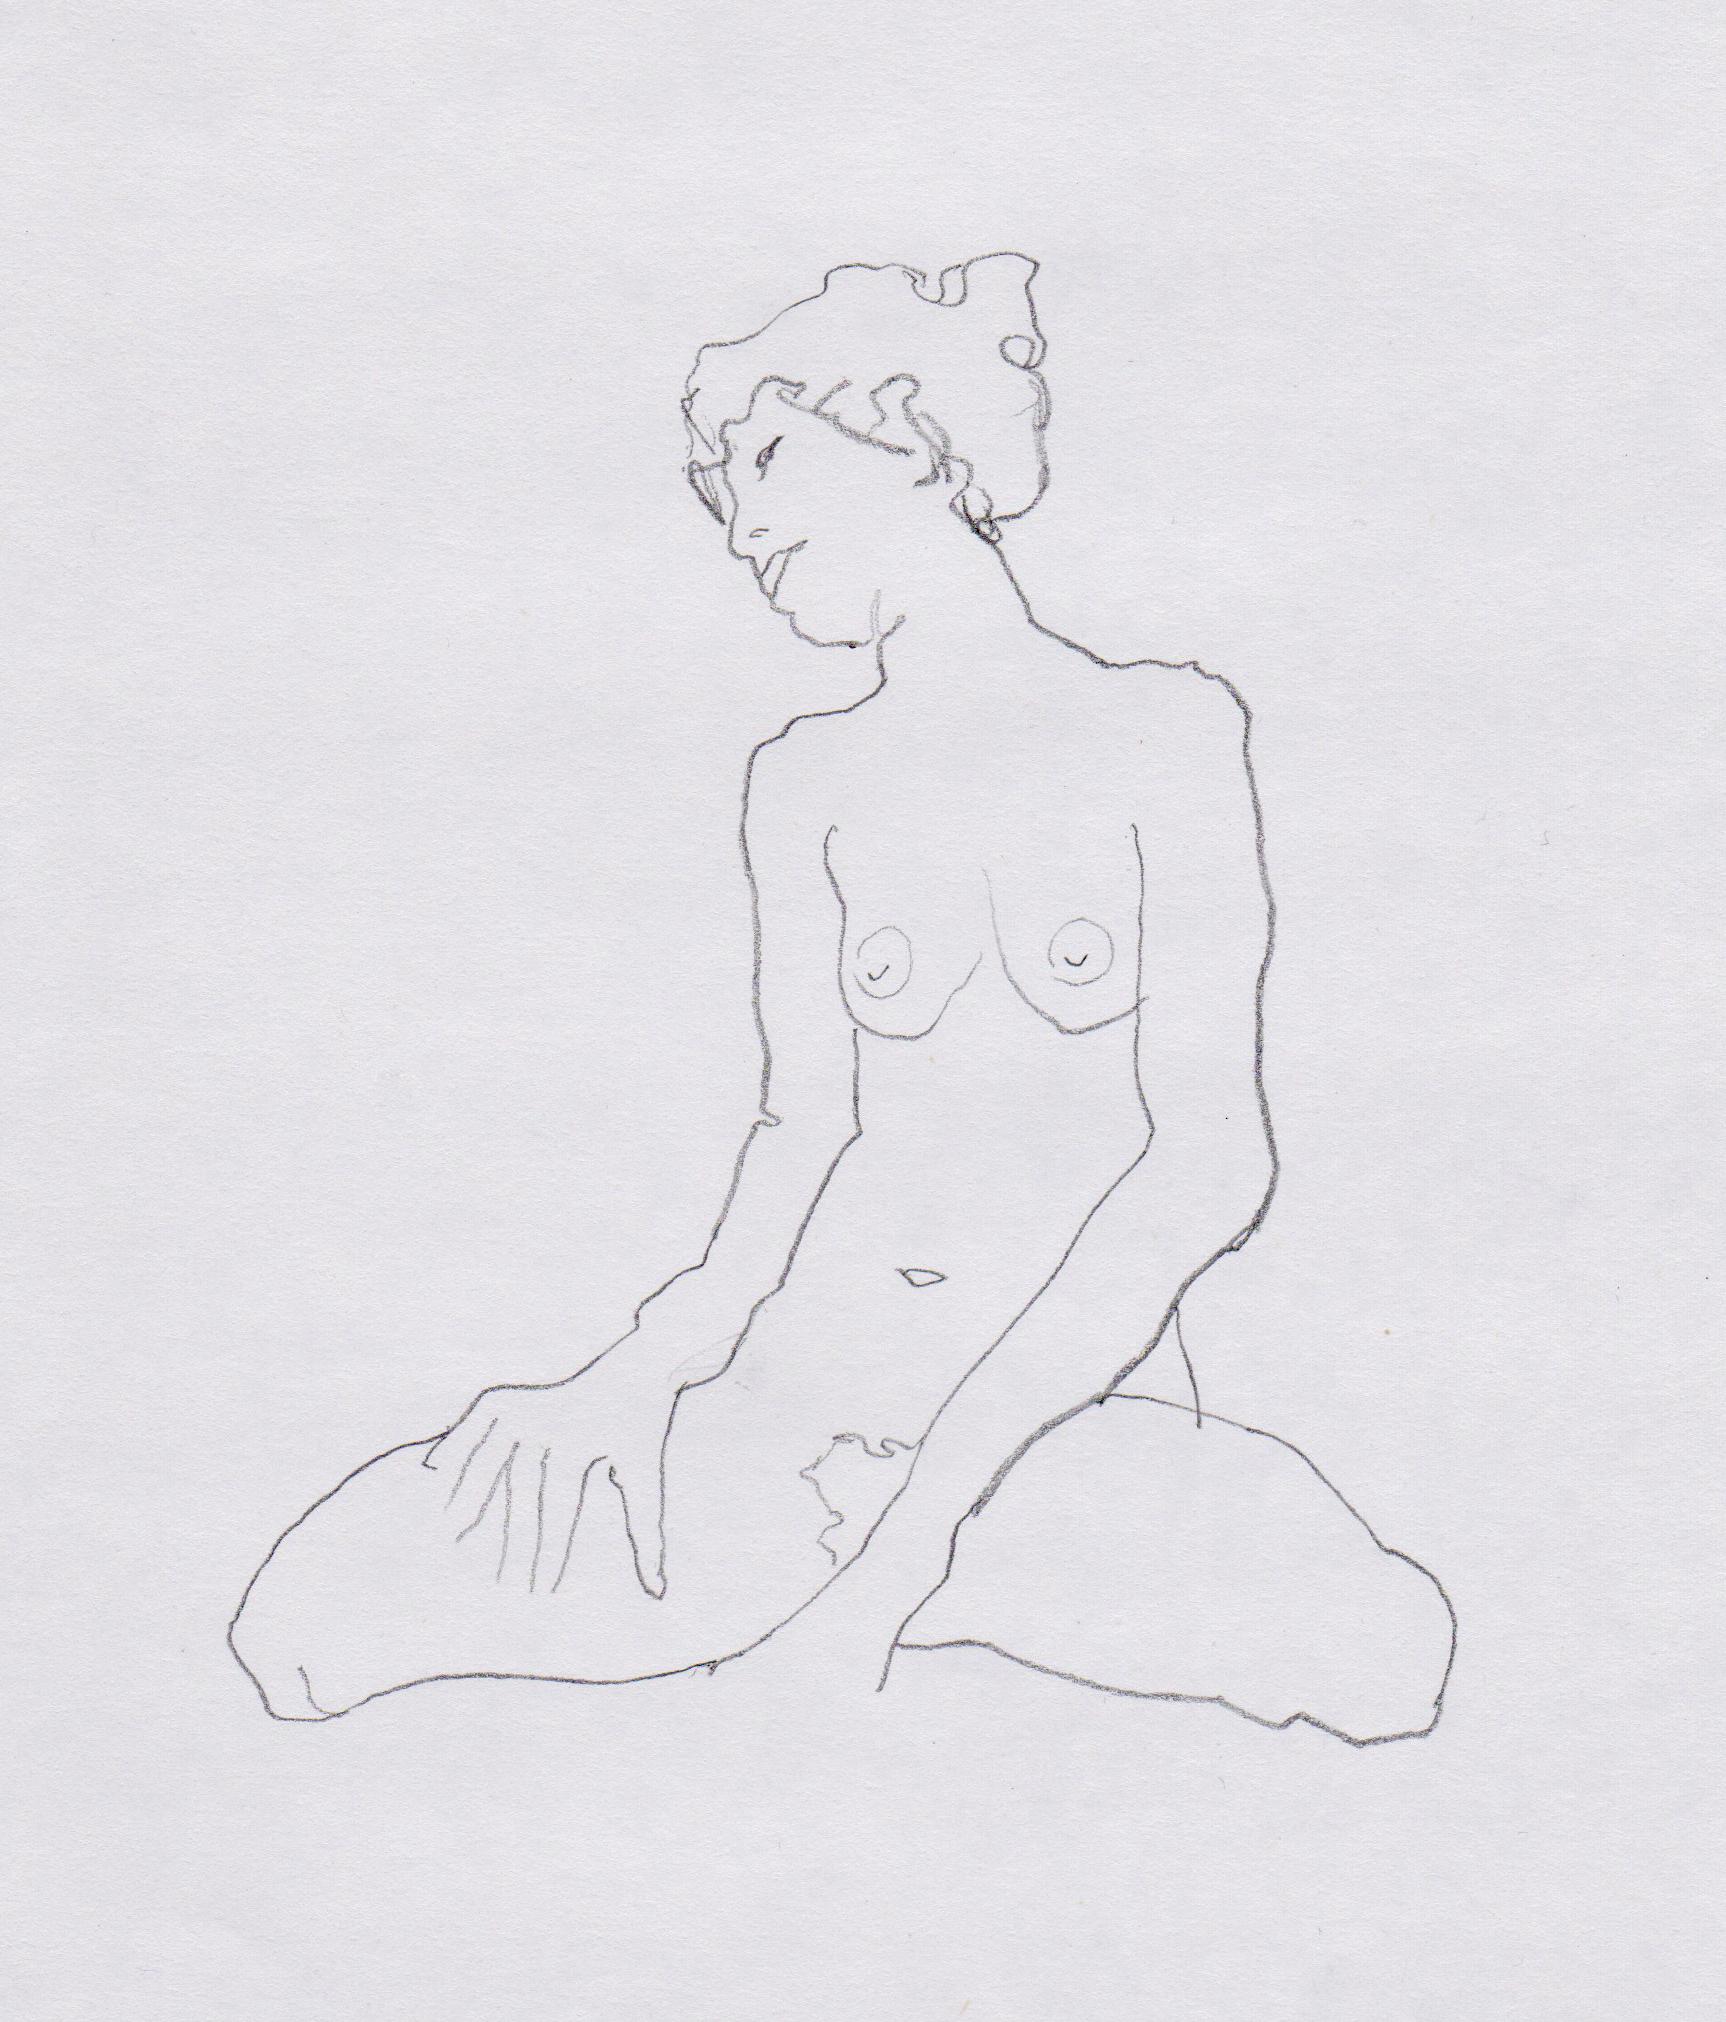 2016_Sketch_F-Beudin_Pia-Haufert_06